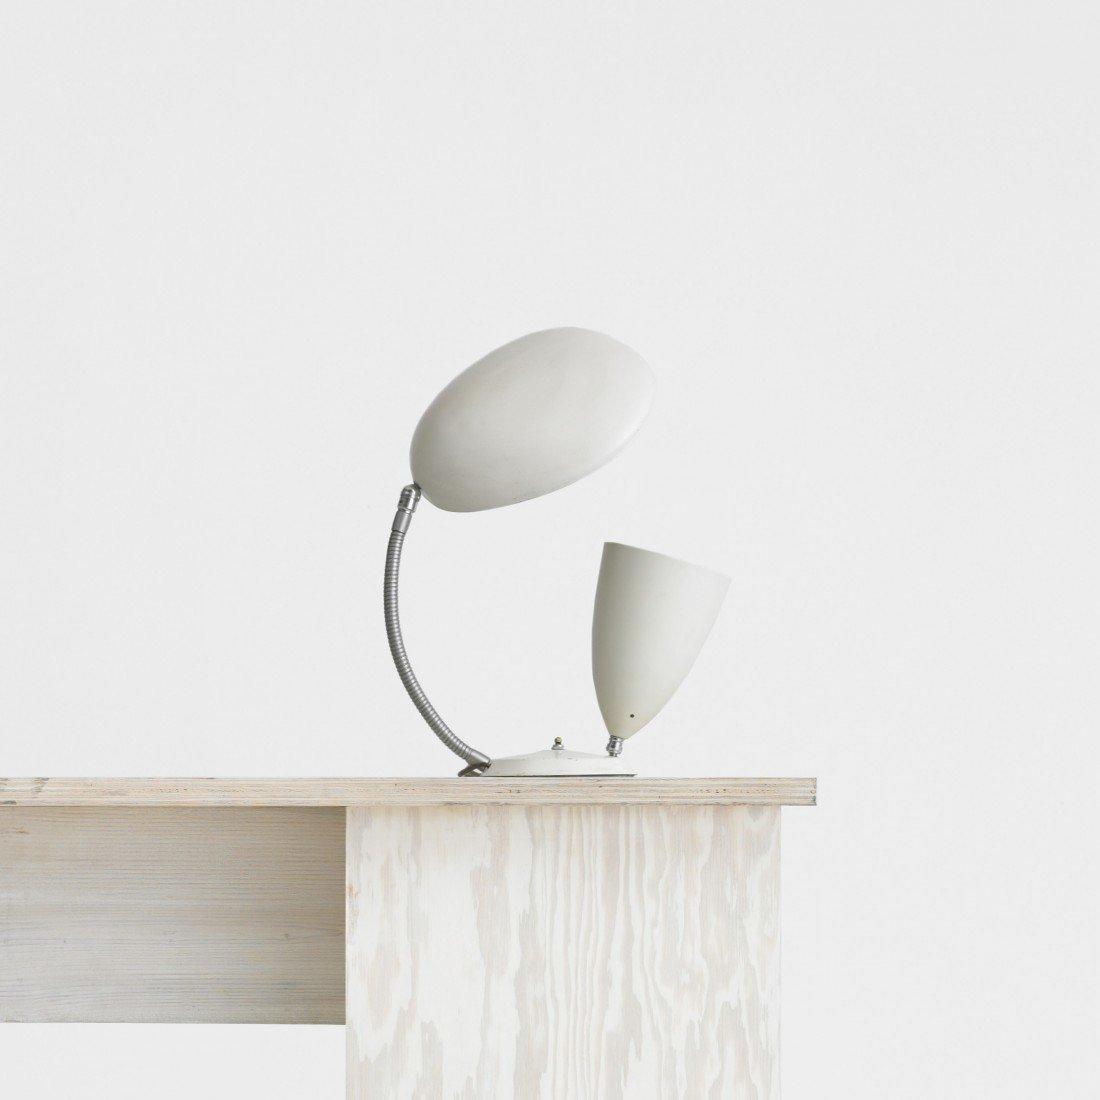 101: Greta  Magnusson Grossman table lamp